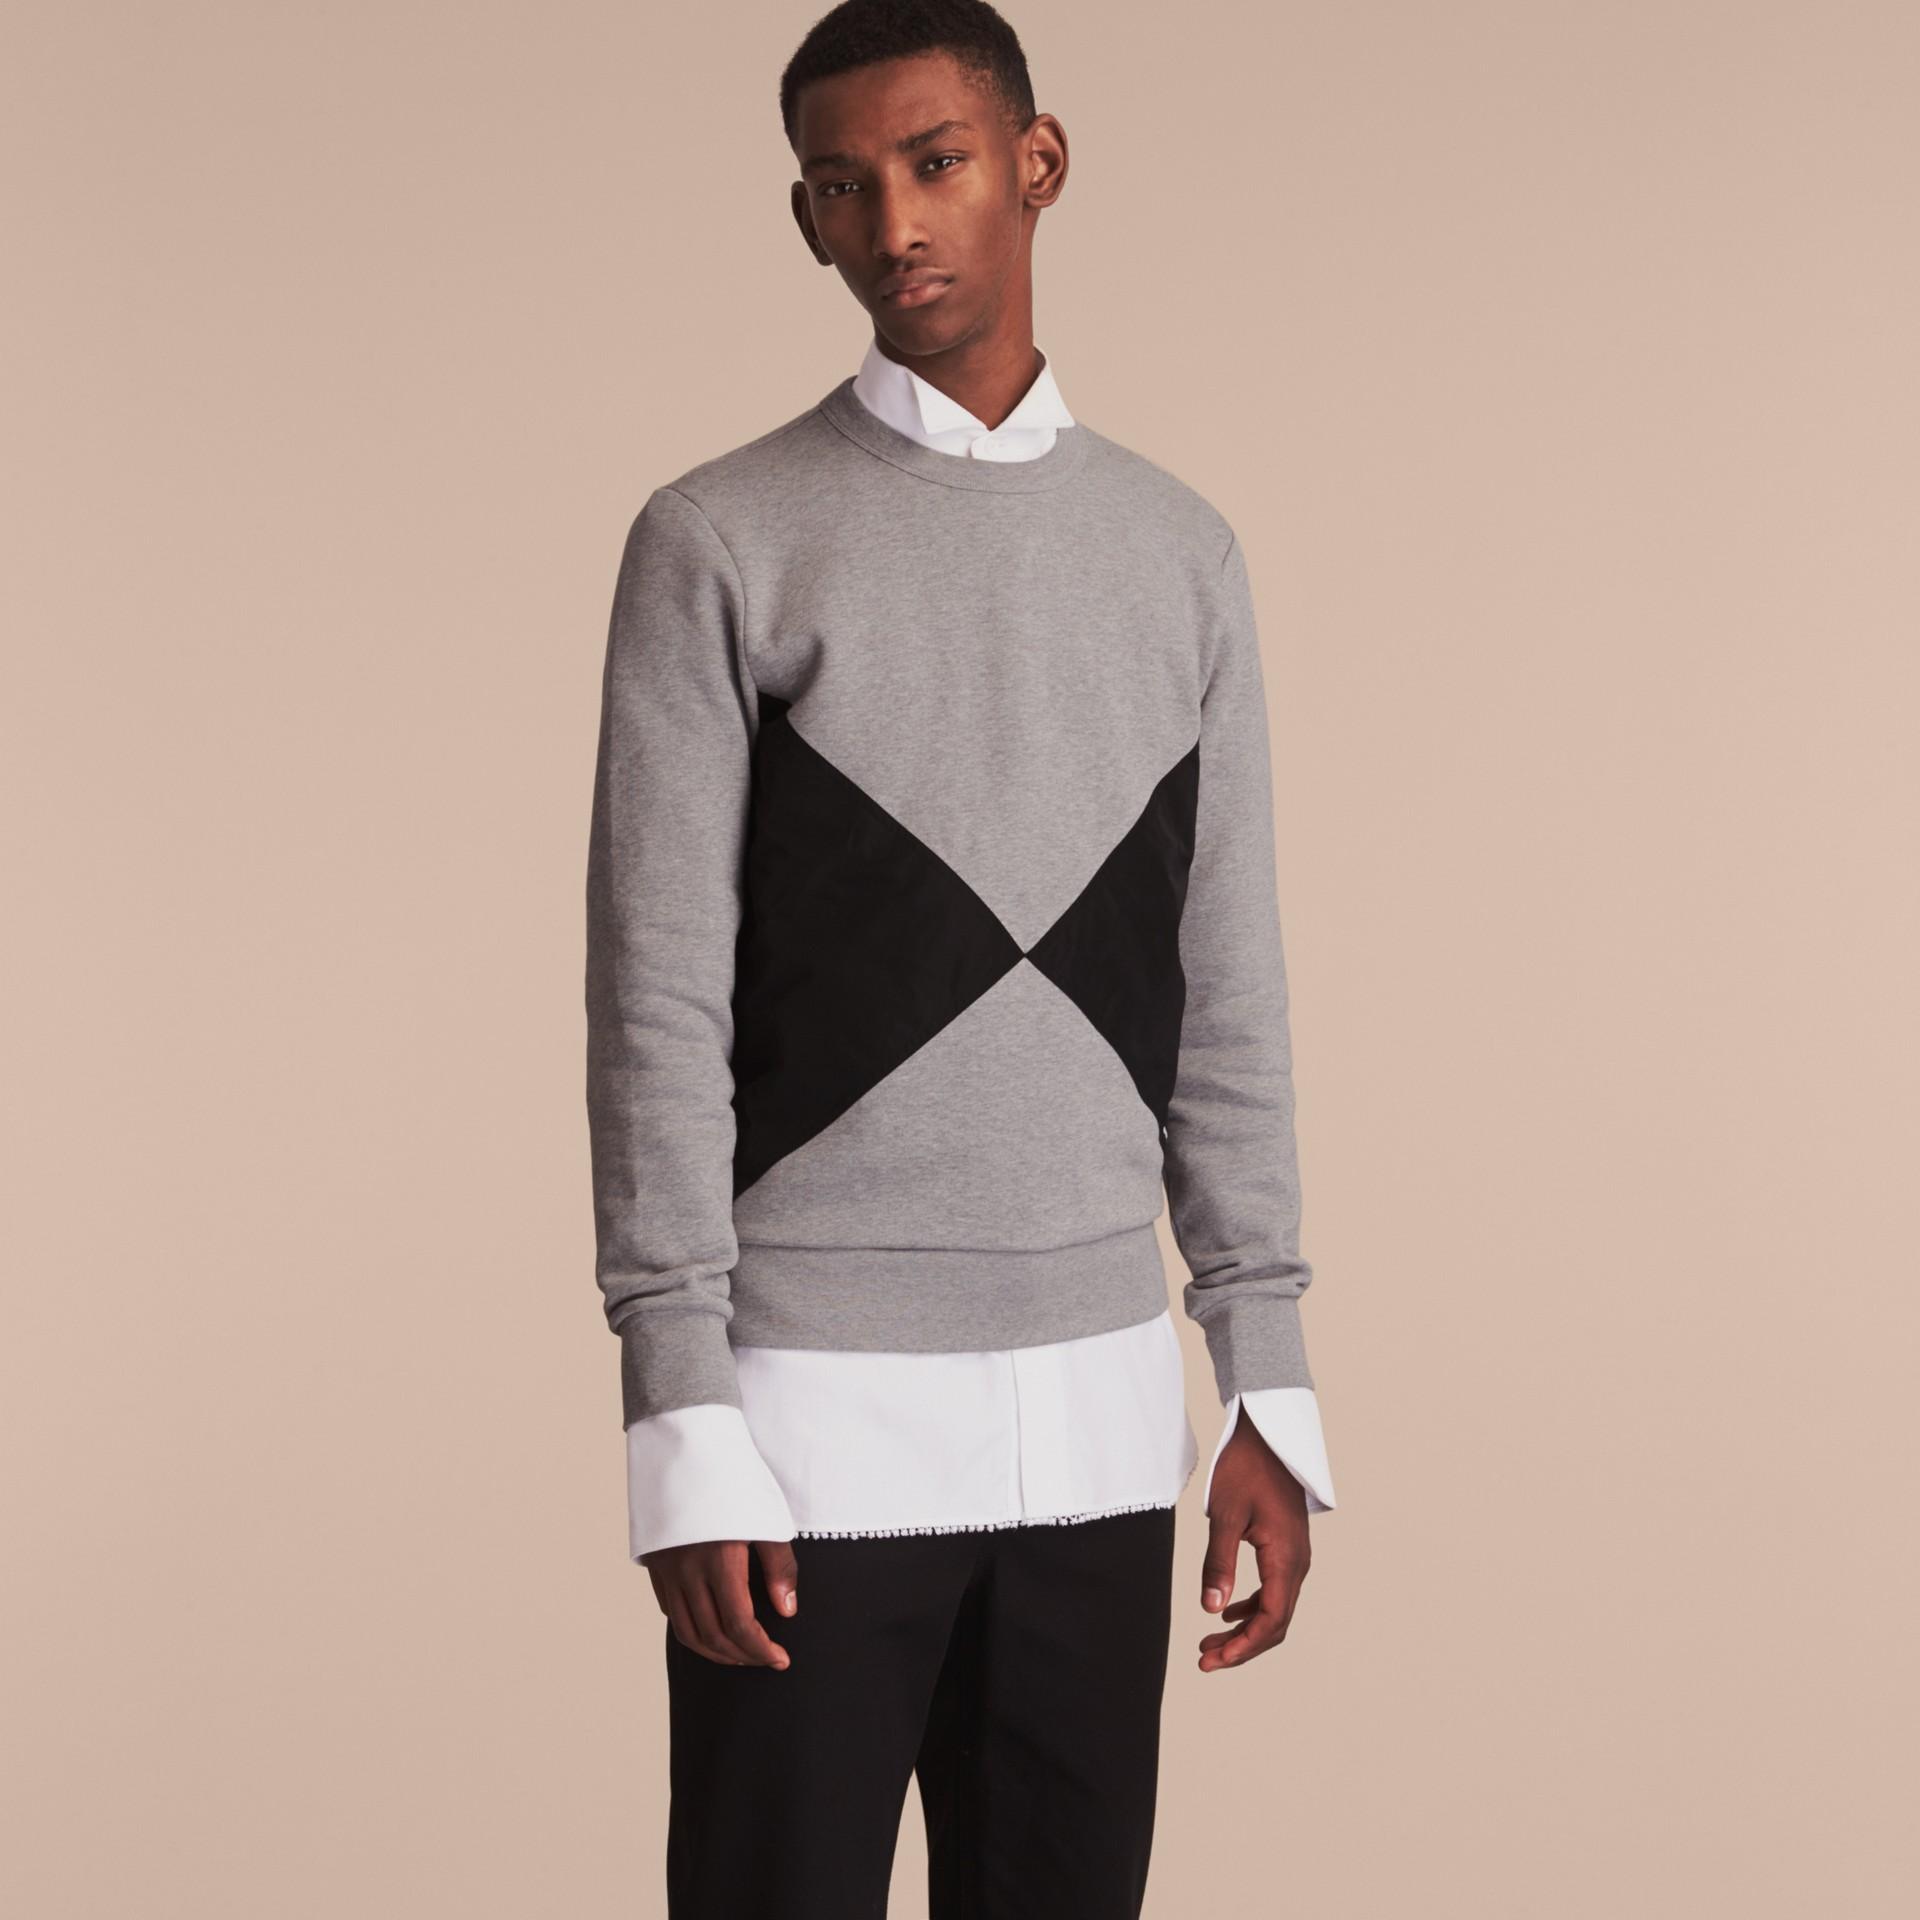 Overlaid Geometric Motif Sweatshirt - gallery image 6